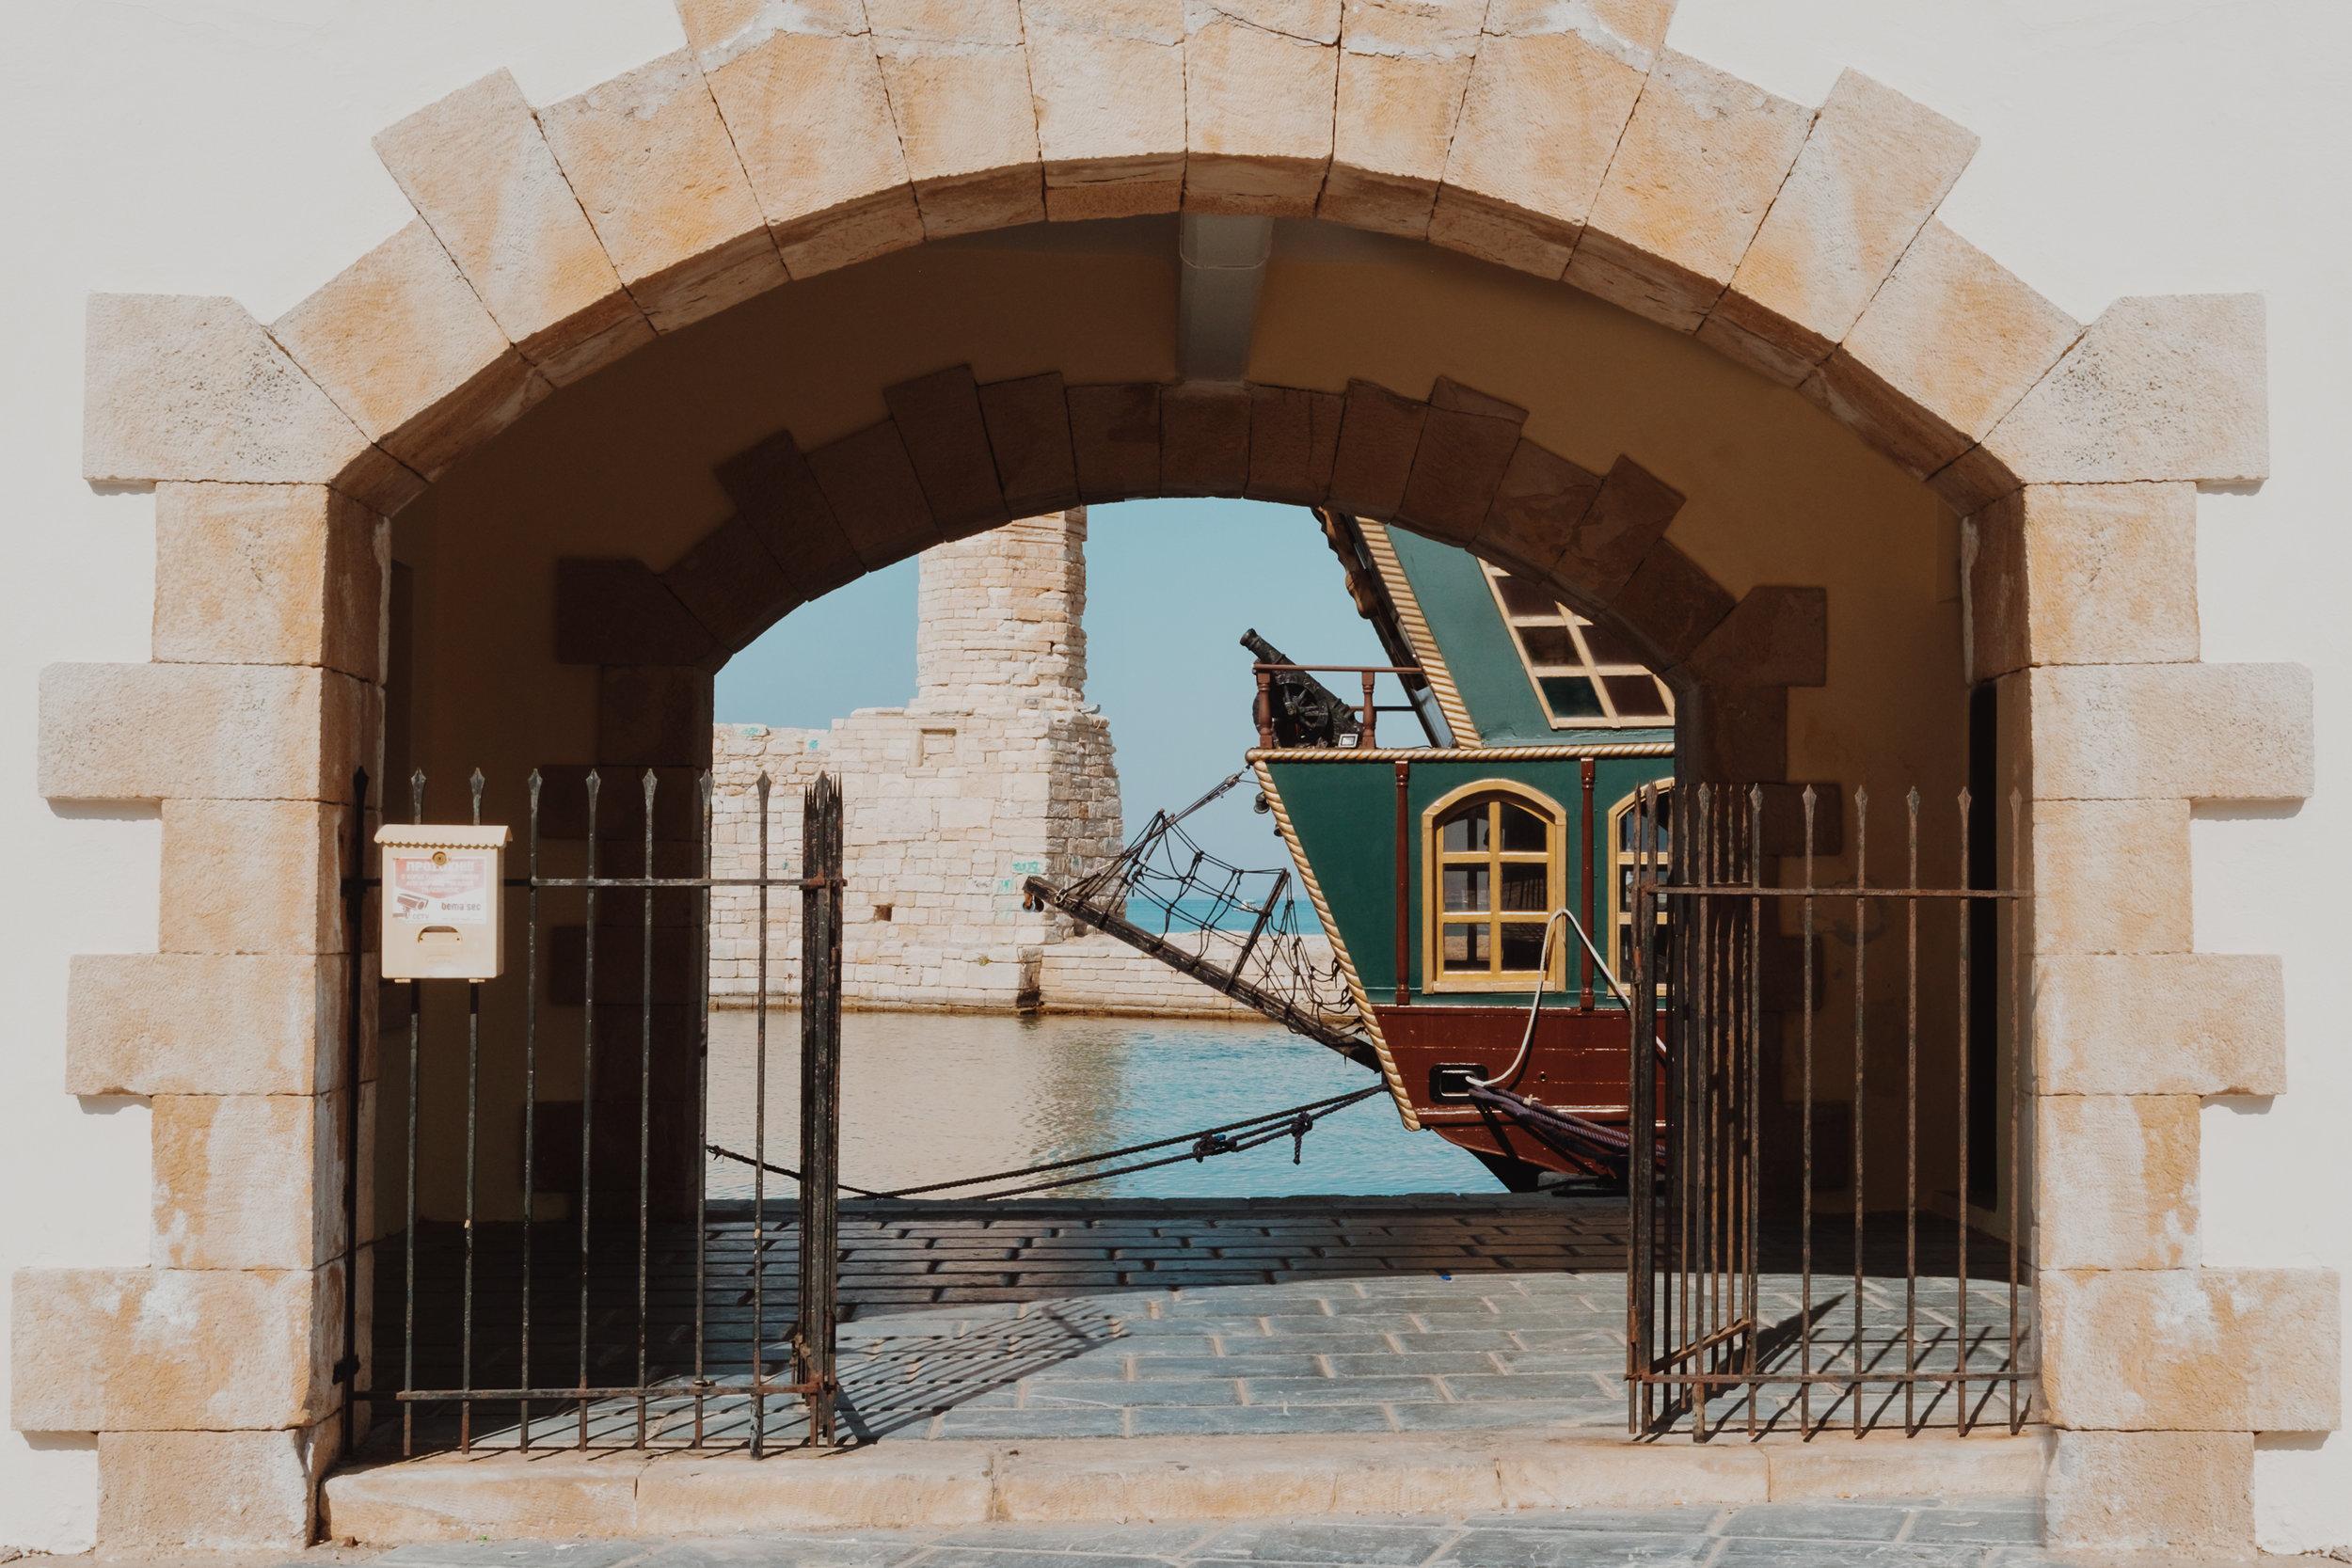 pirate hole